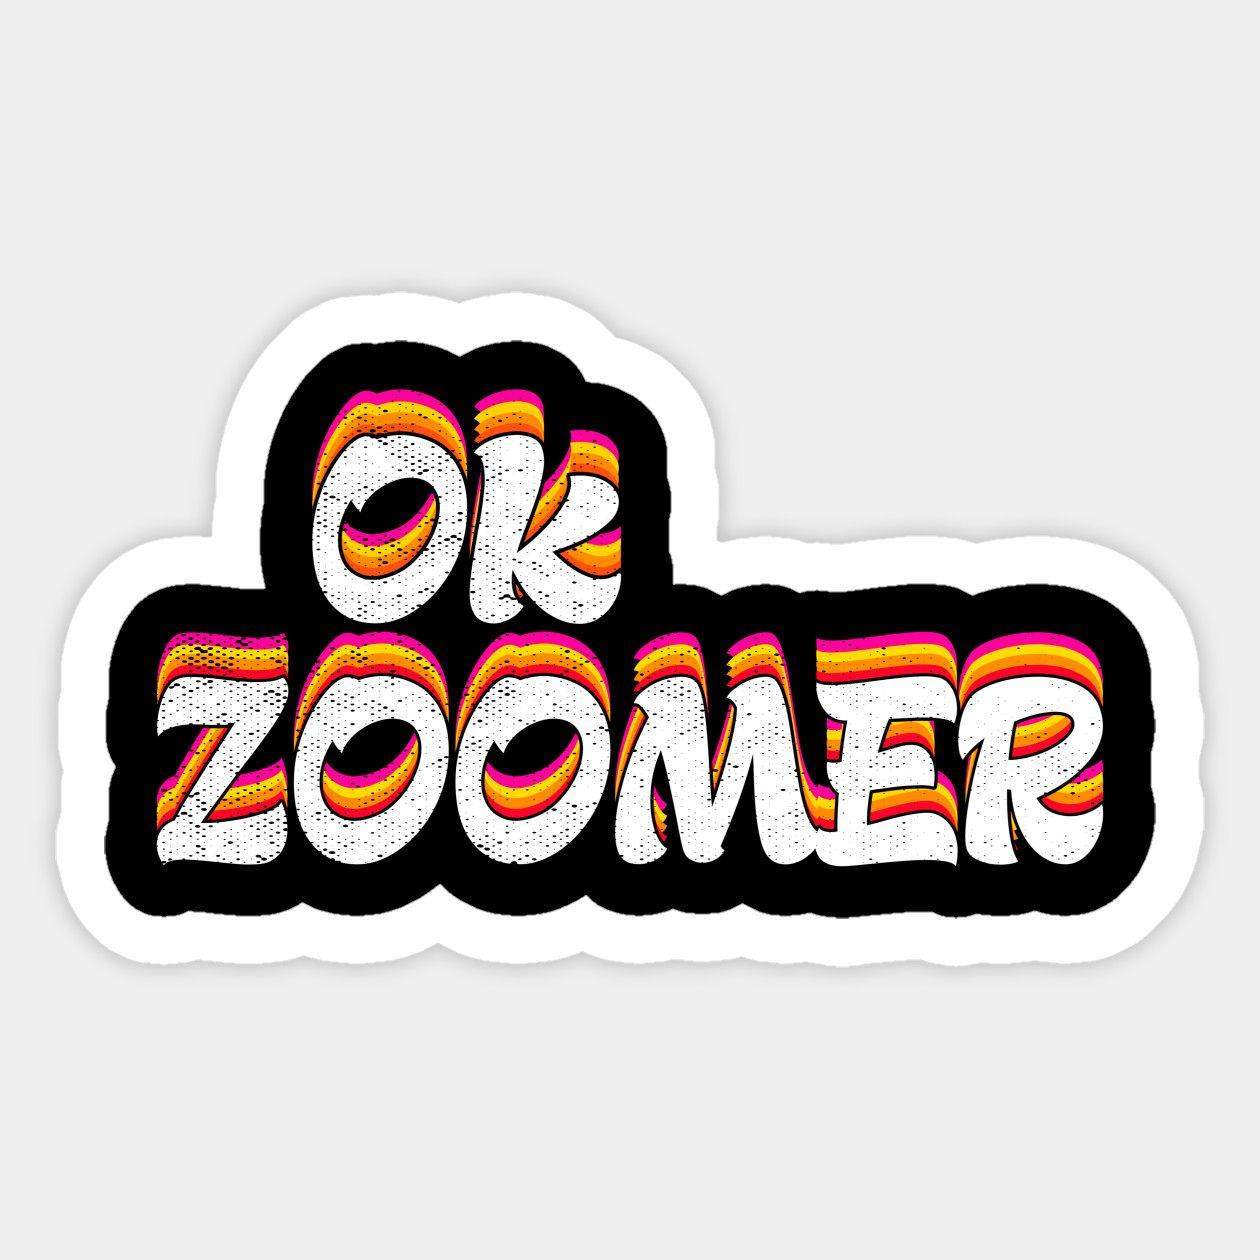 Ok Zoomer Sticker Funny Quotes Vinyl Sticker Stickers